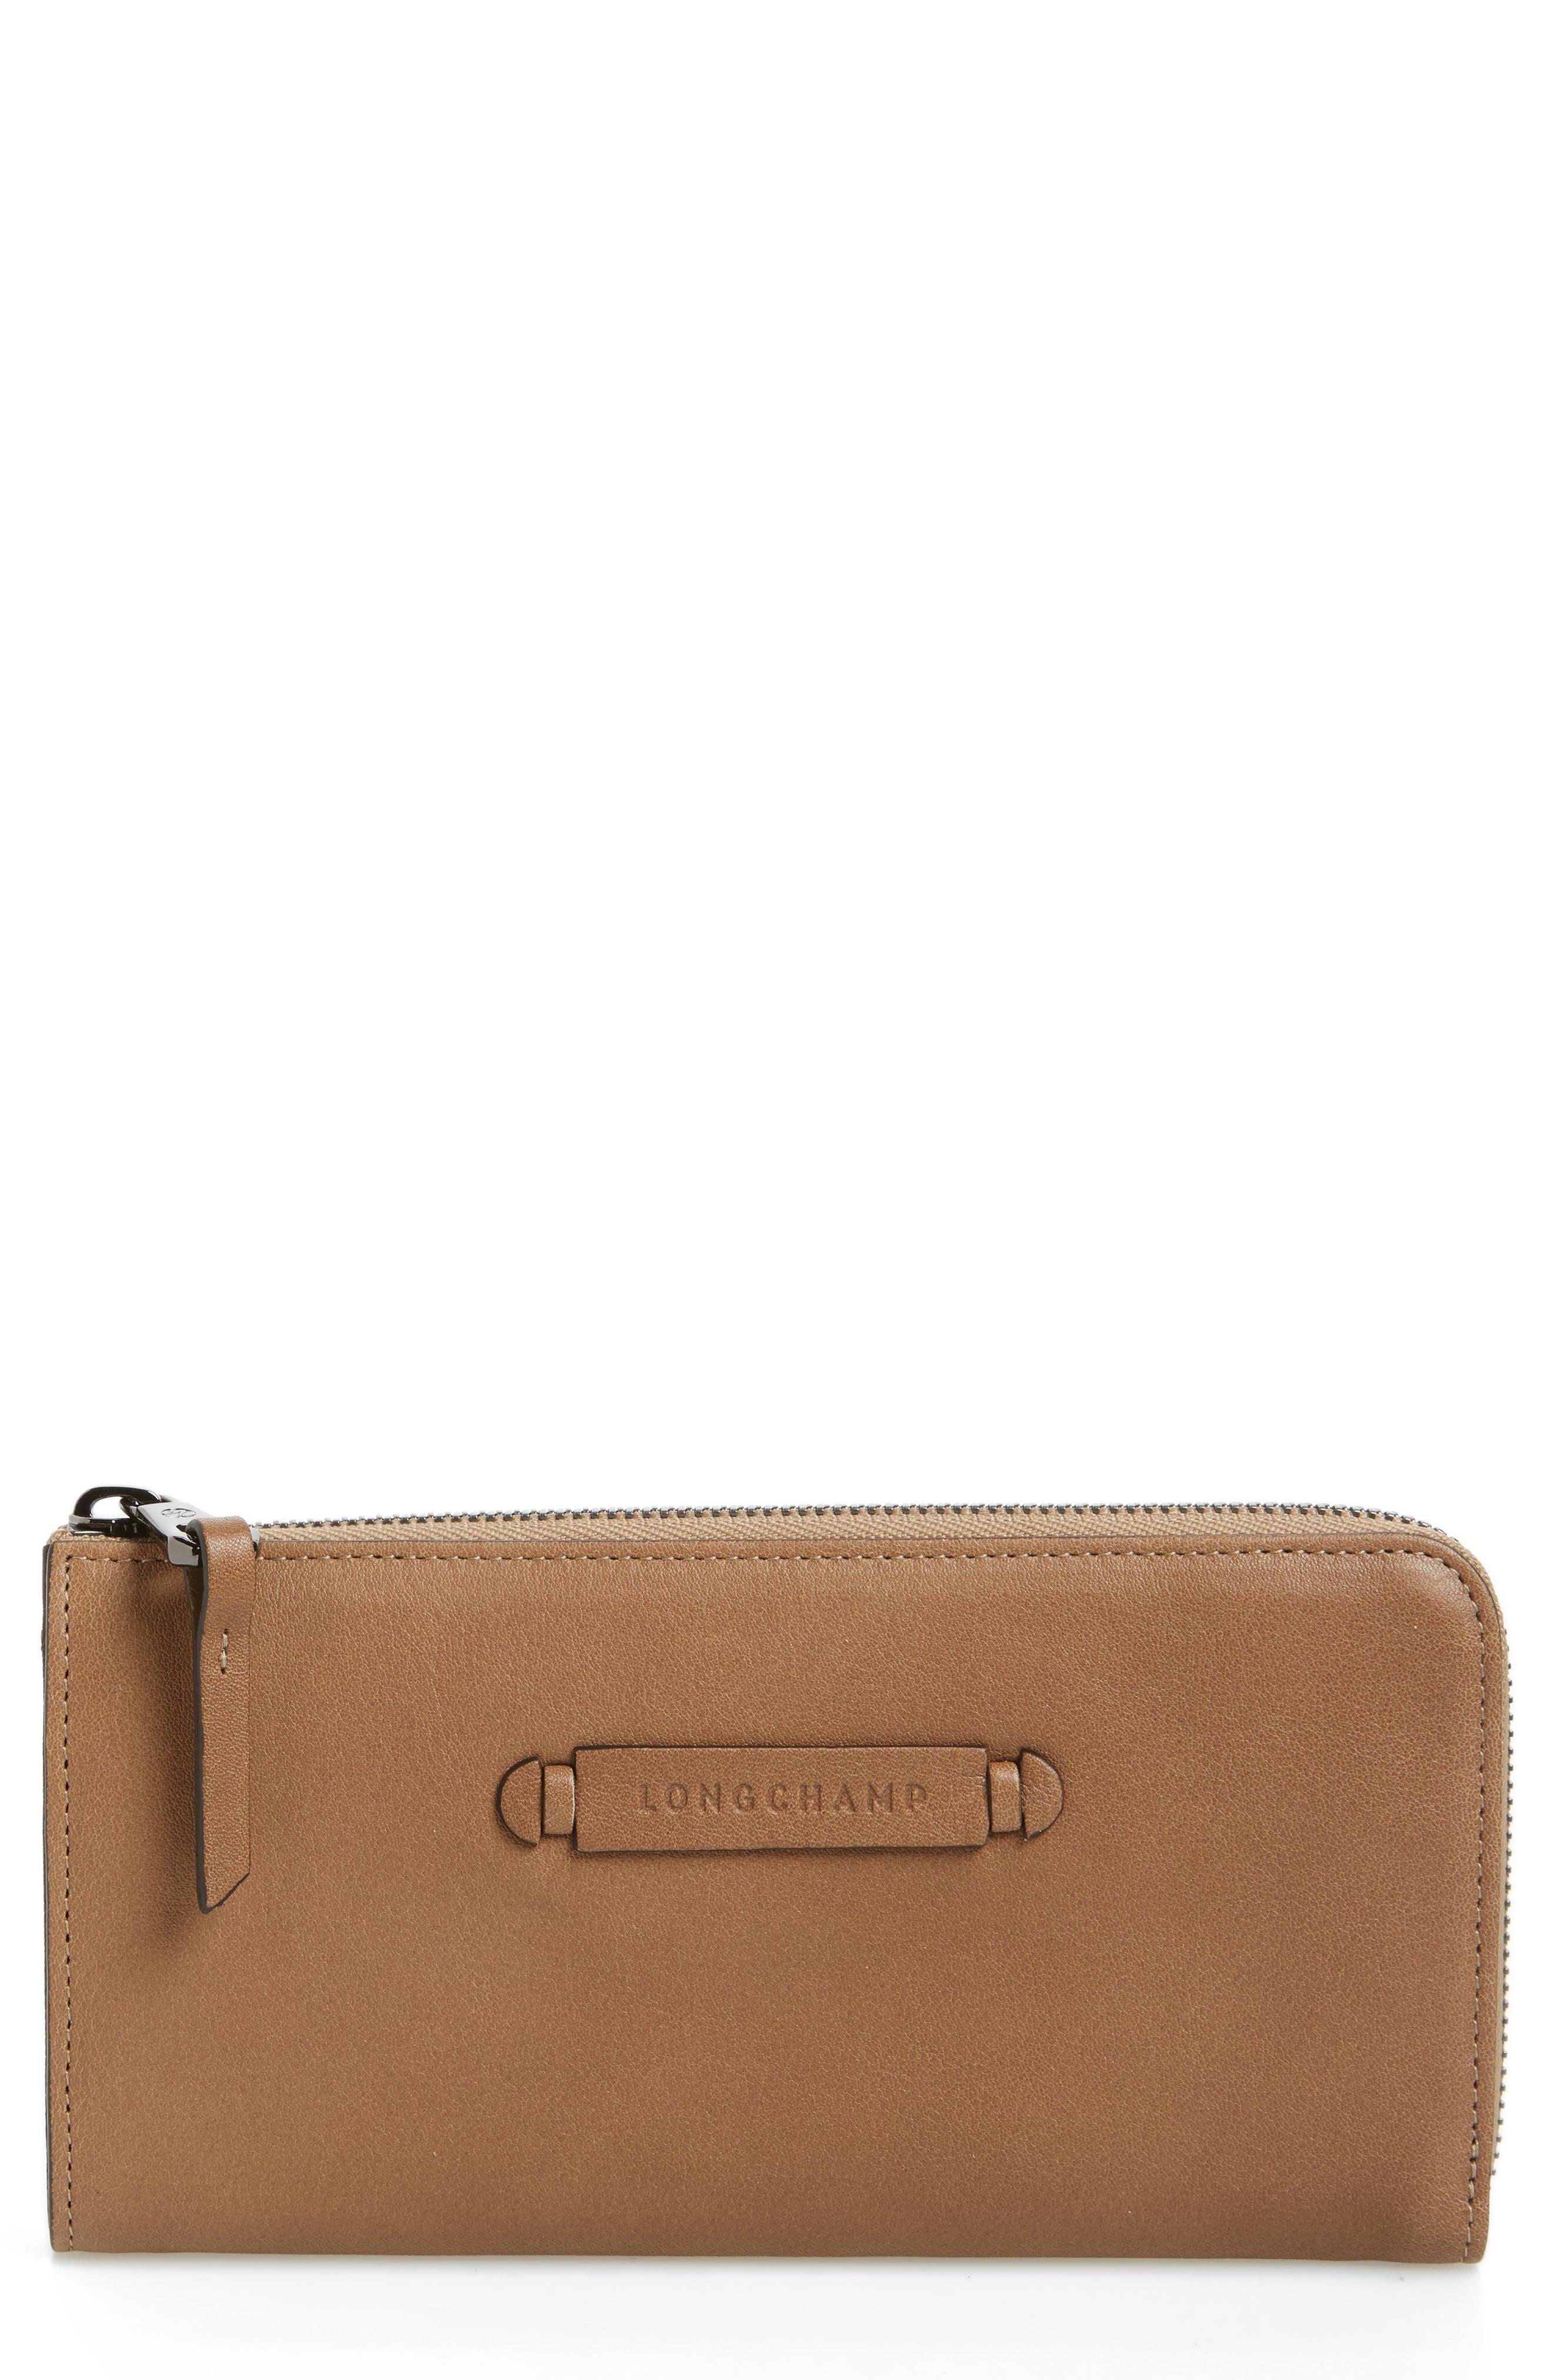 3D Leather Wallet,                         Main,                         color, 250